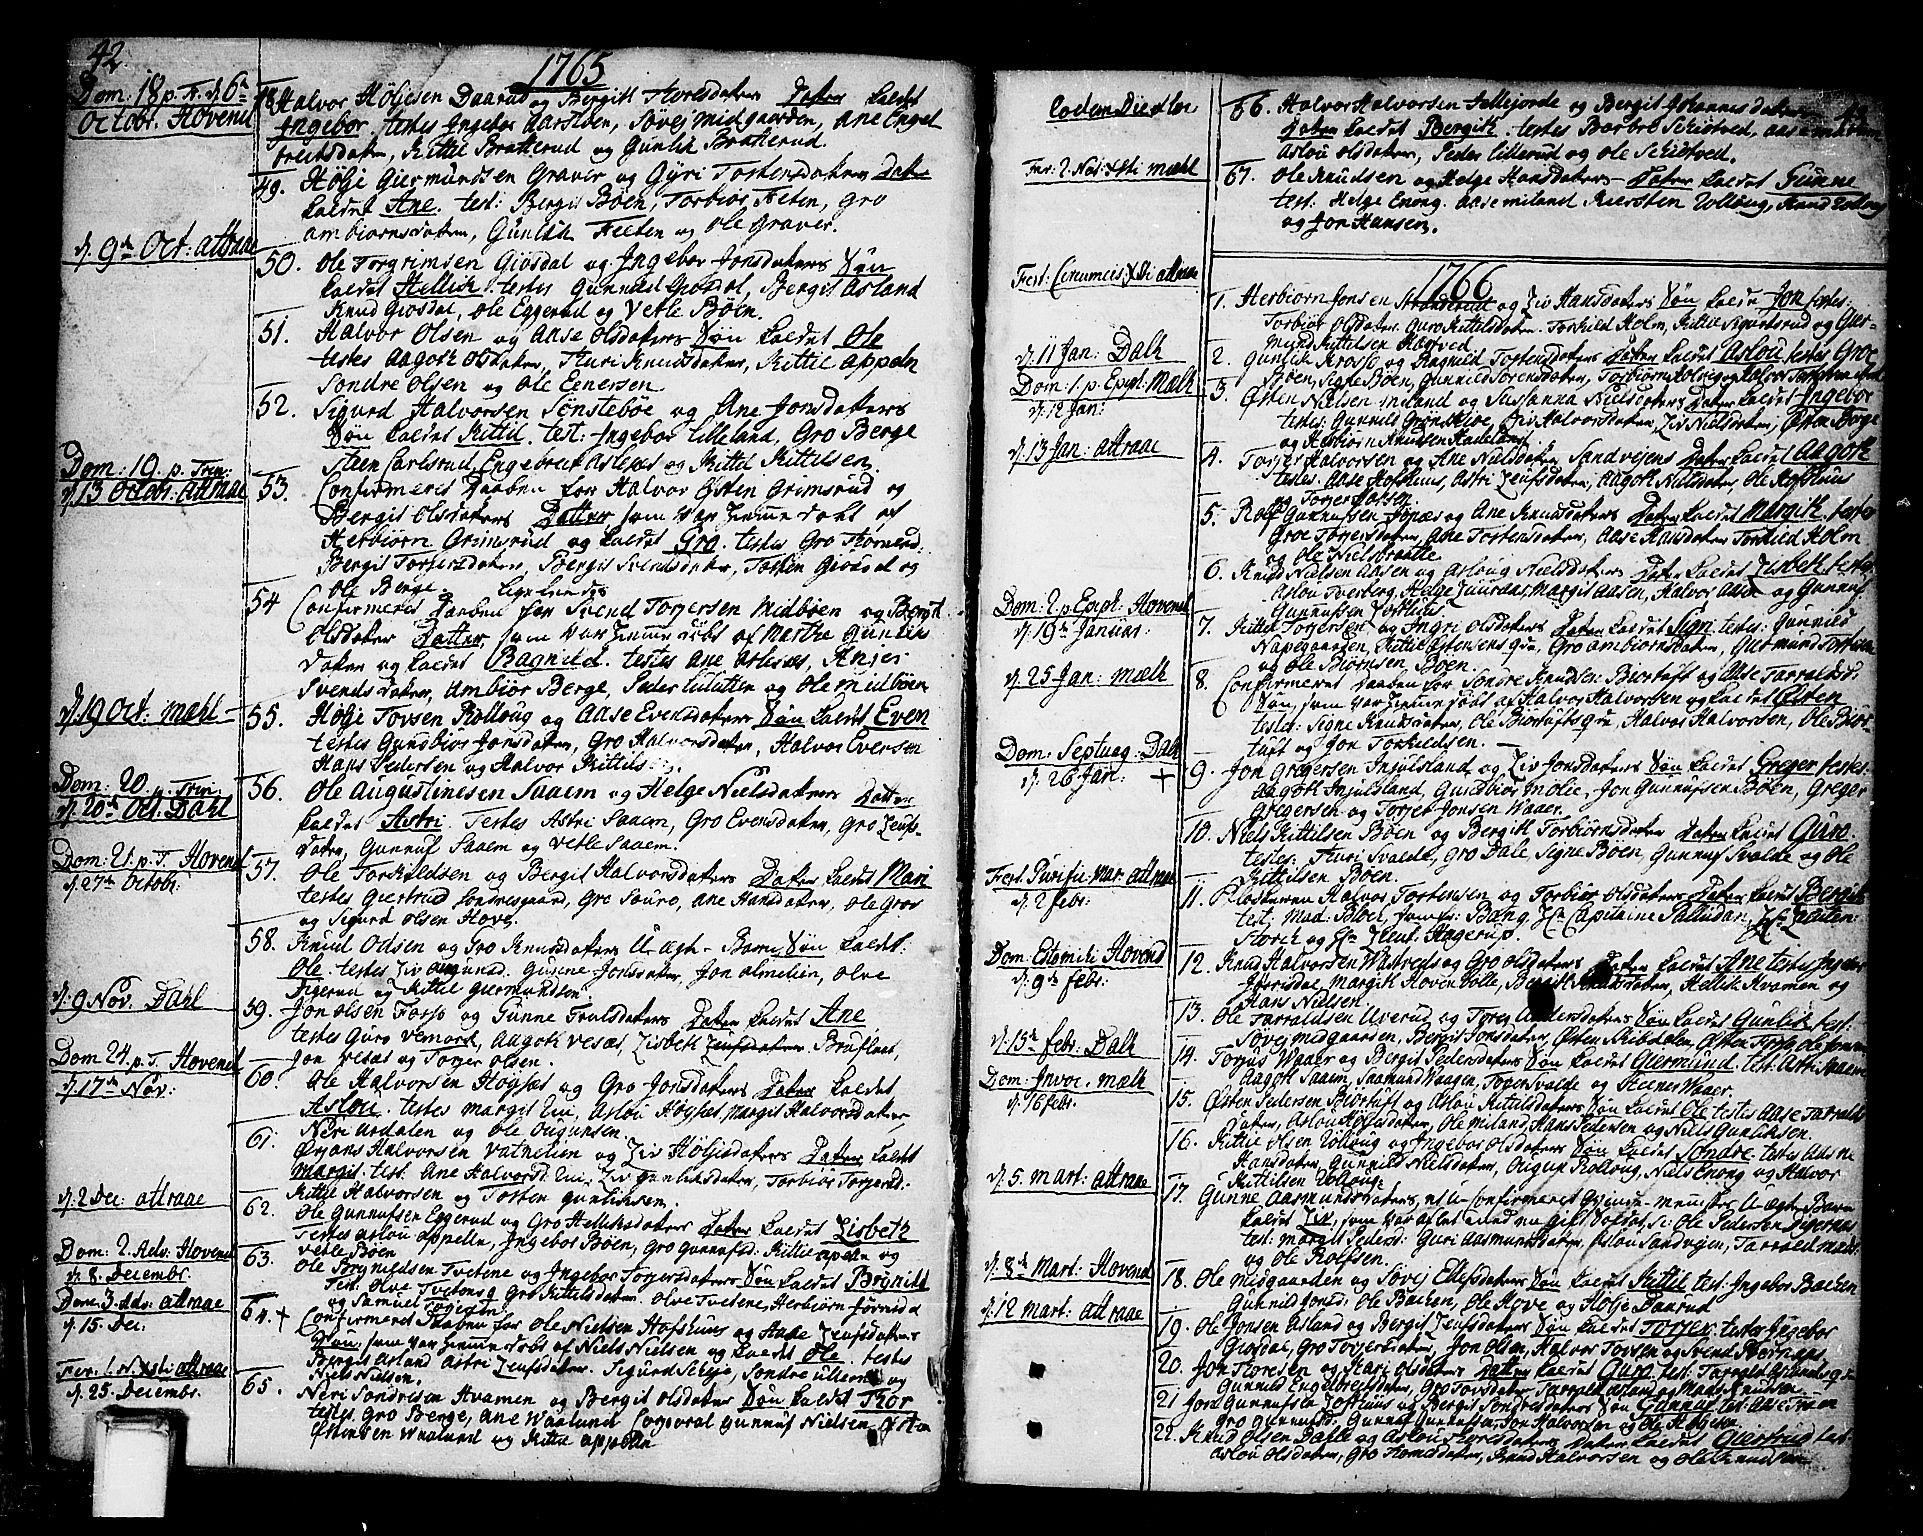 SAKO, Tinn kirkebøker, F/Fa/L0002: Ministerialbok nr. I 2, 1757-1810, s. 42-43